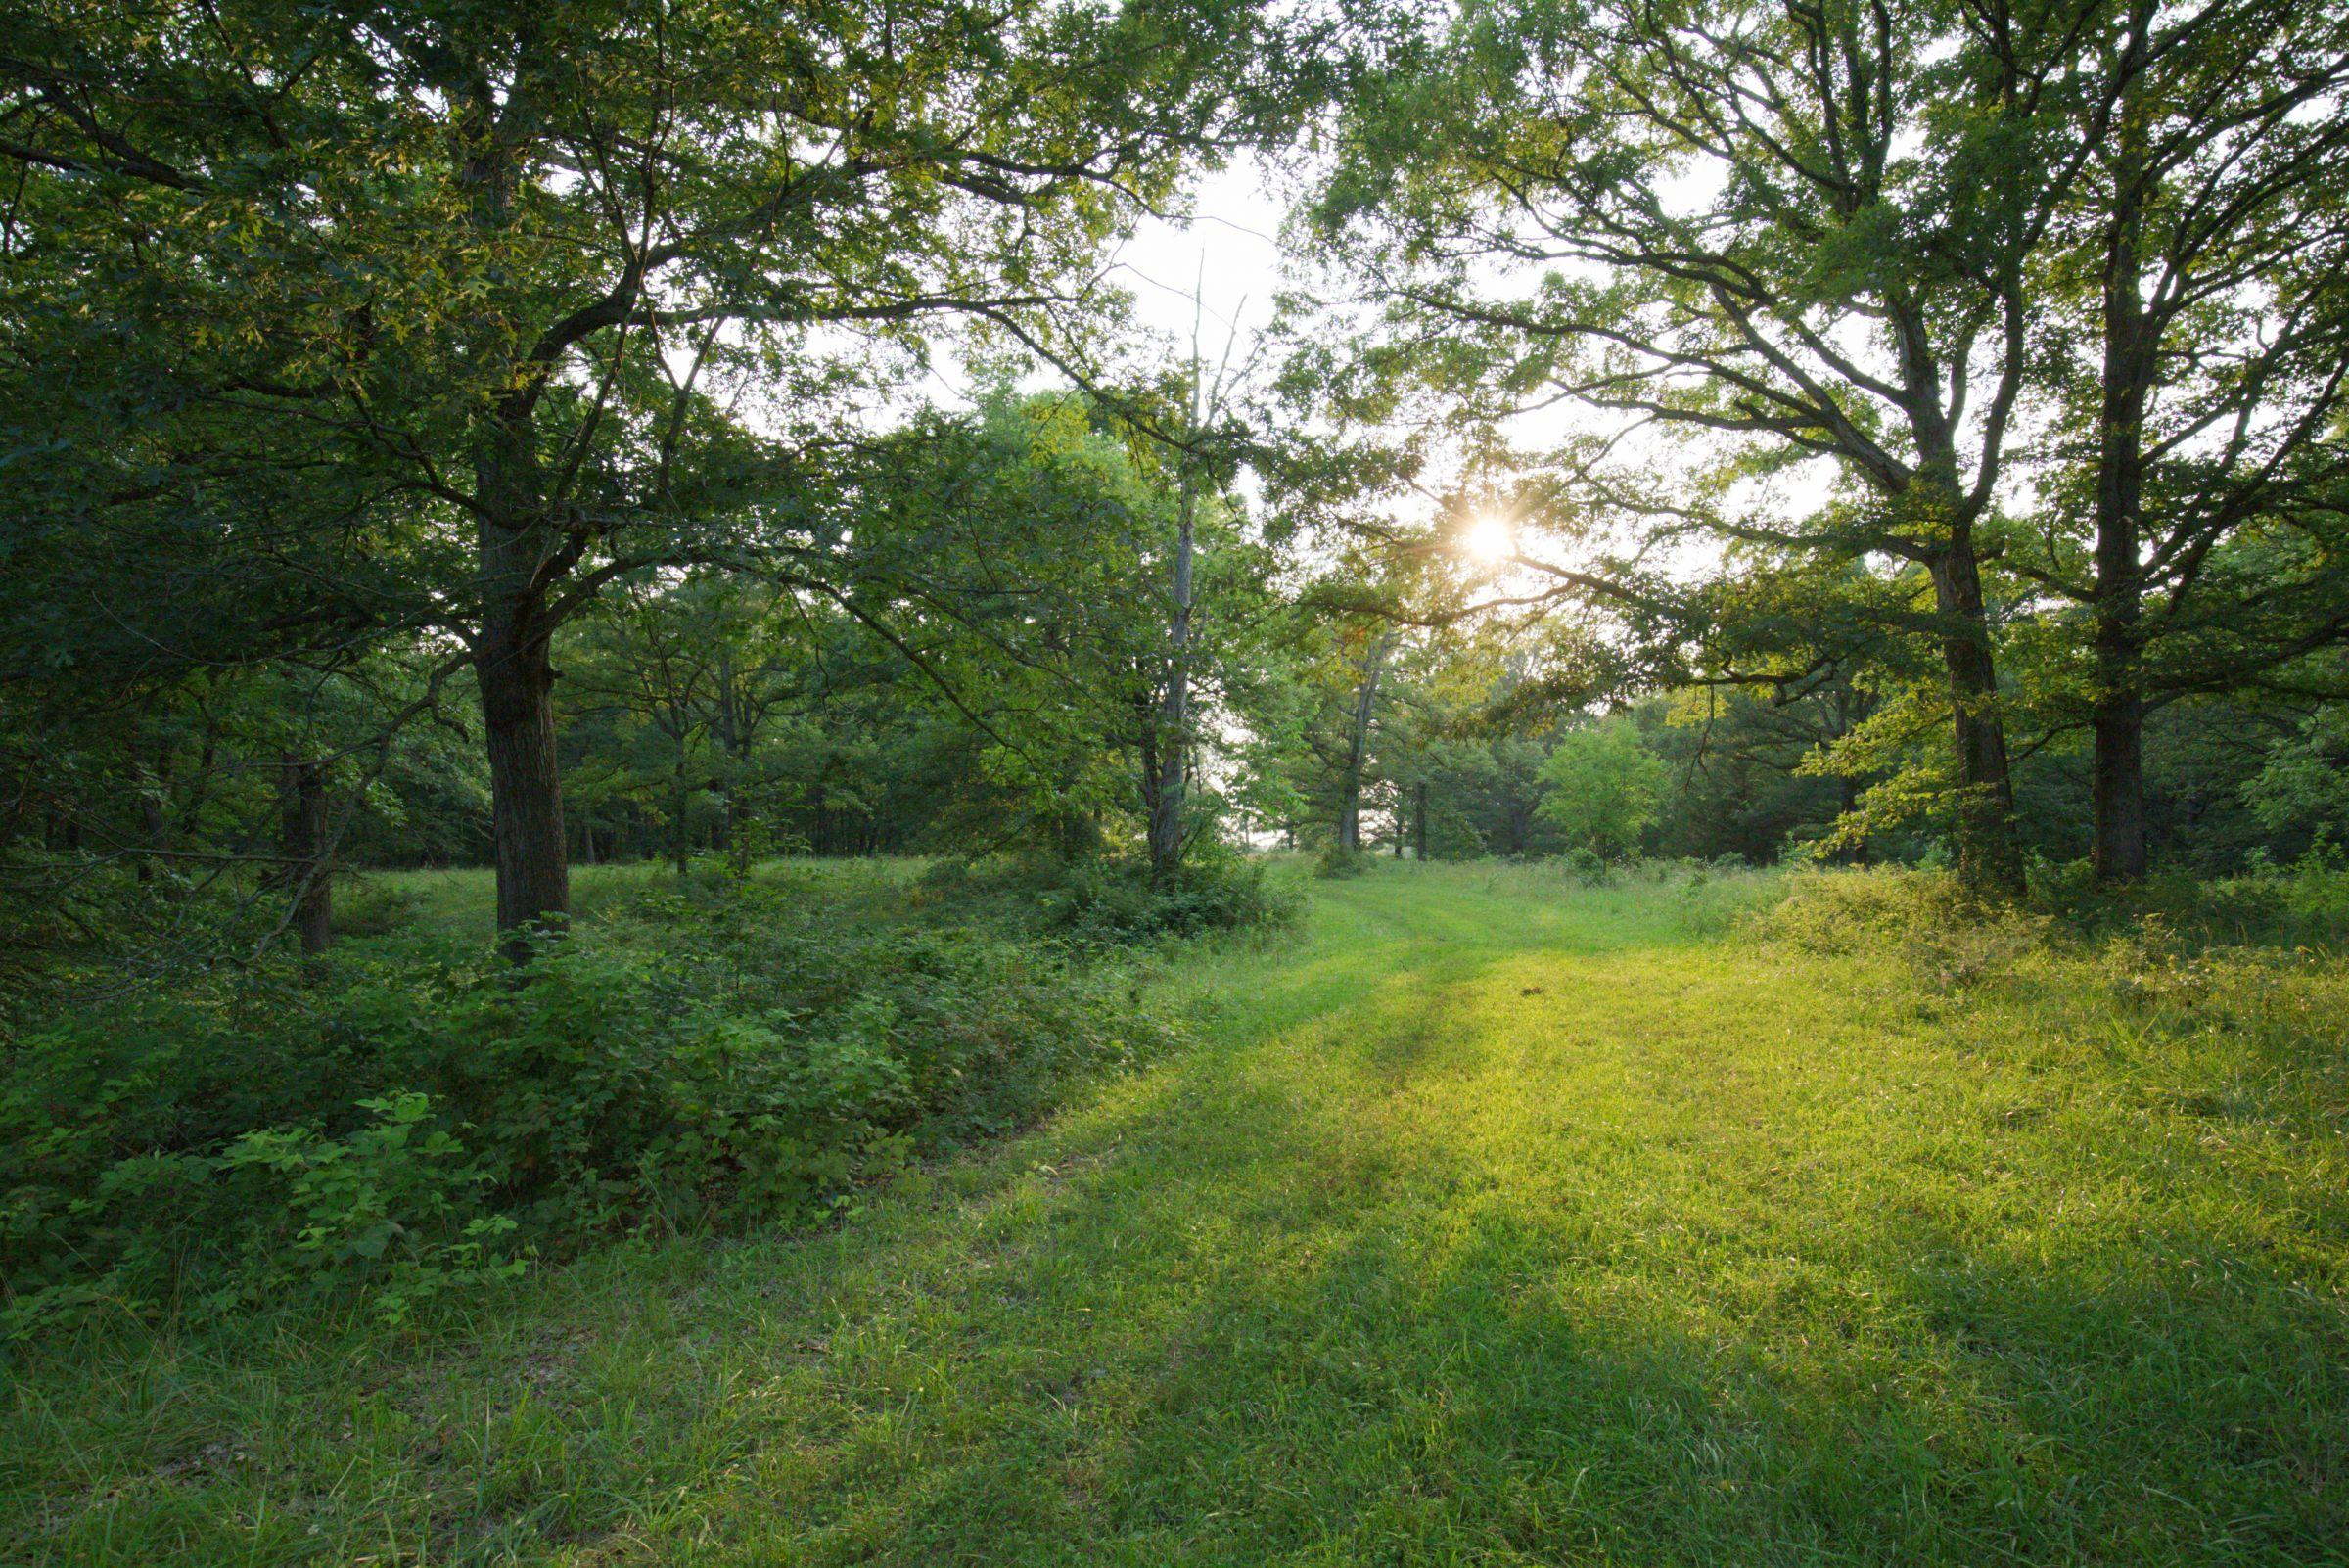 land-lee-county-iowa-340-acres-listing-number-15649-4-2021-07-21-184940.jpg